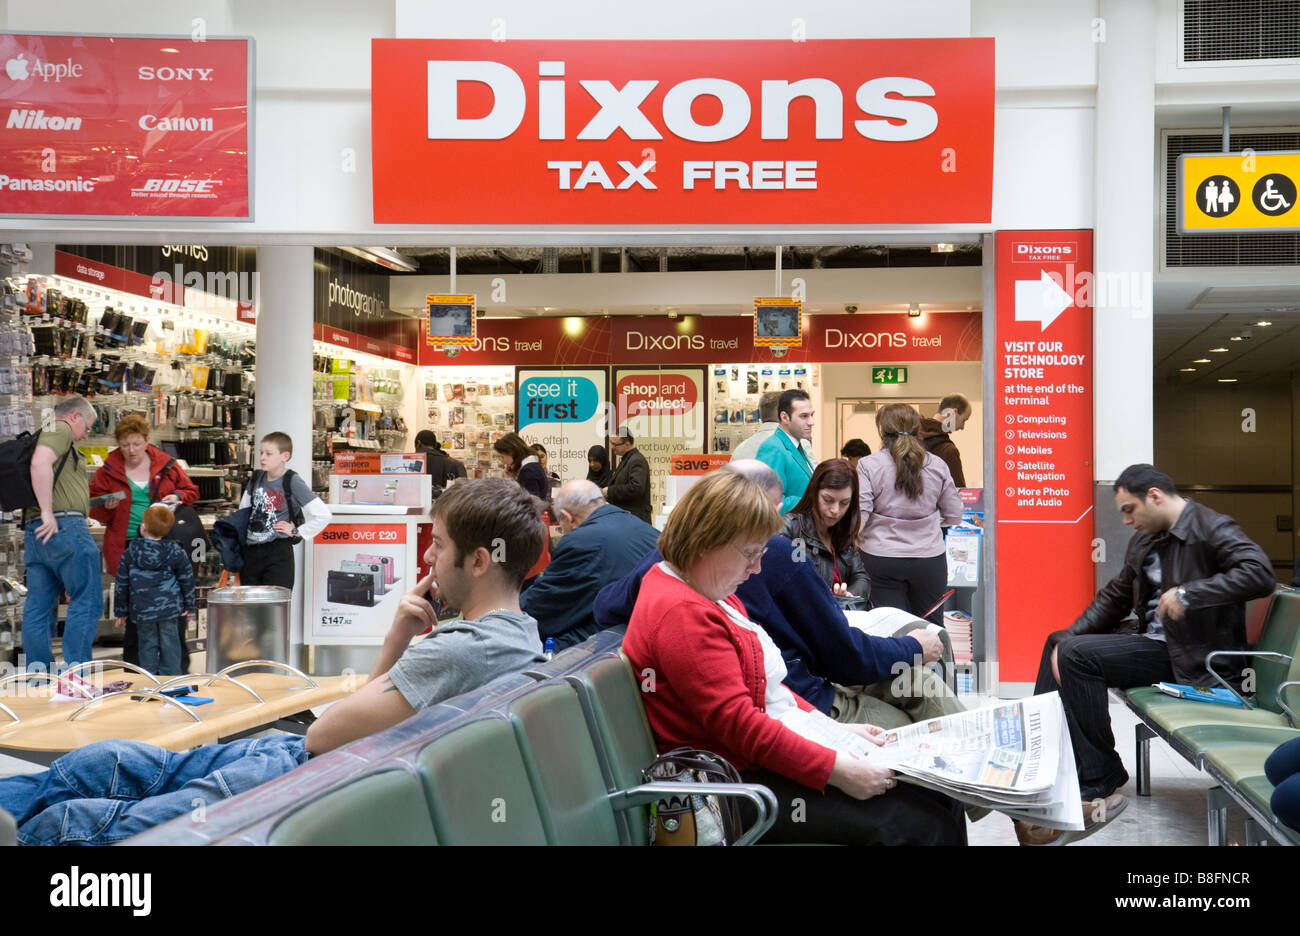 Dixons Store Stock Photos & Dixons Store Stock Images - Alamy